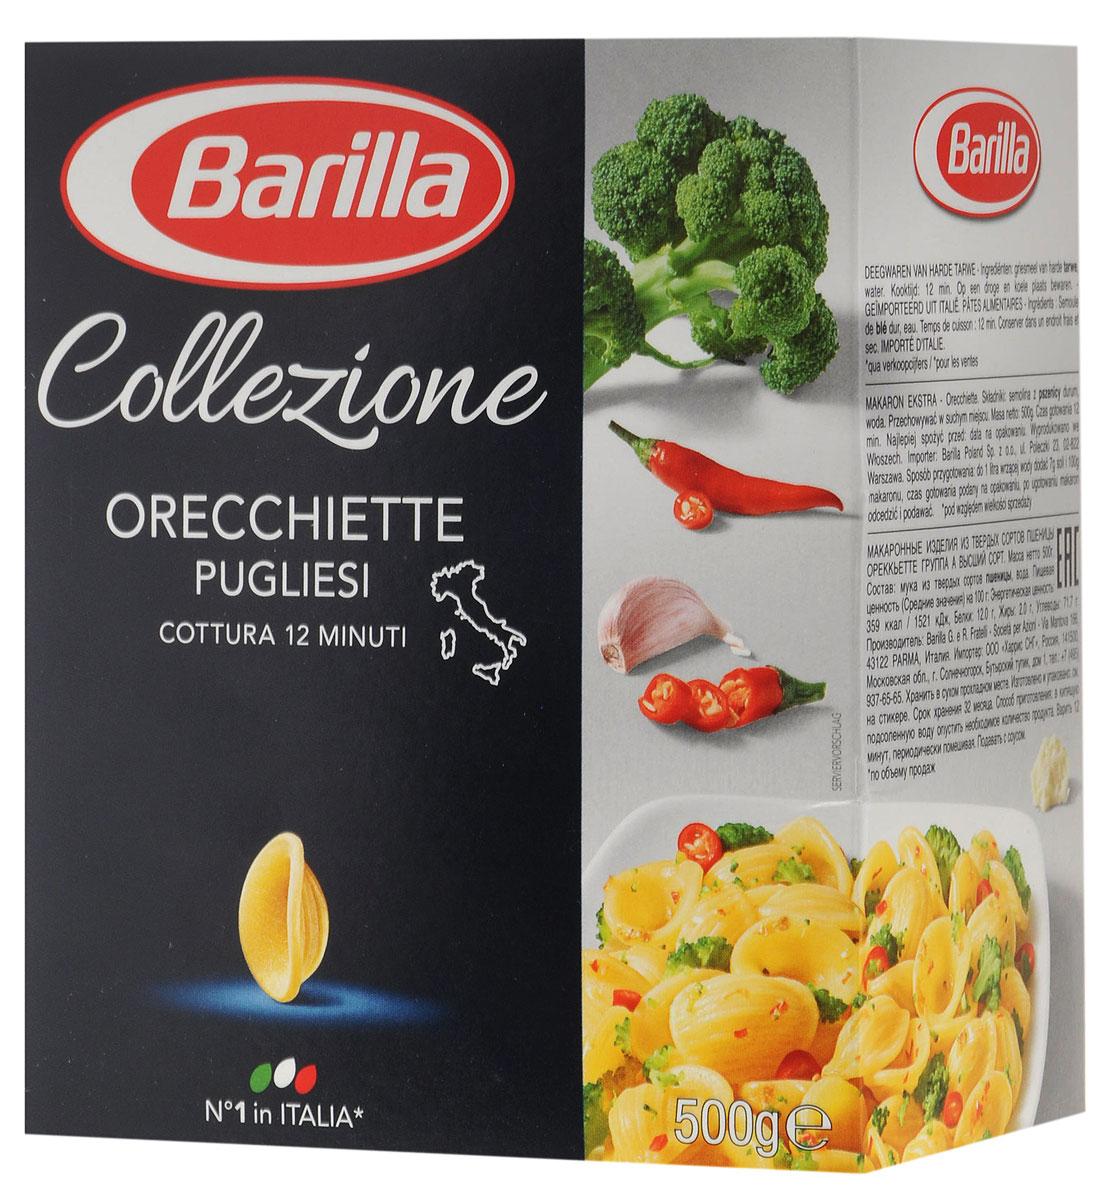 Barilla Orecchiette паста орекьетте, 500 г